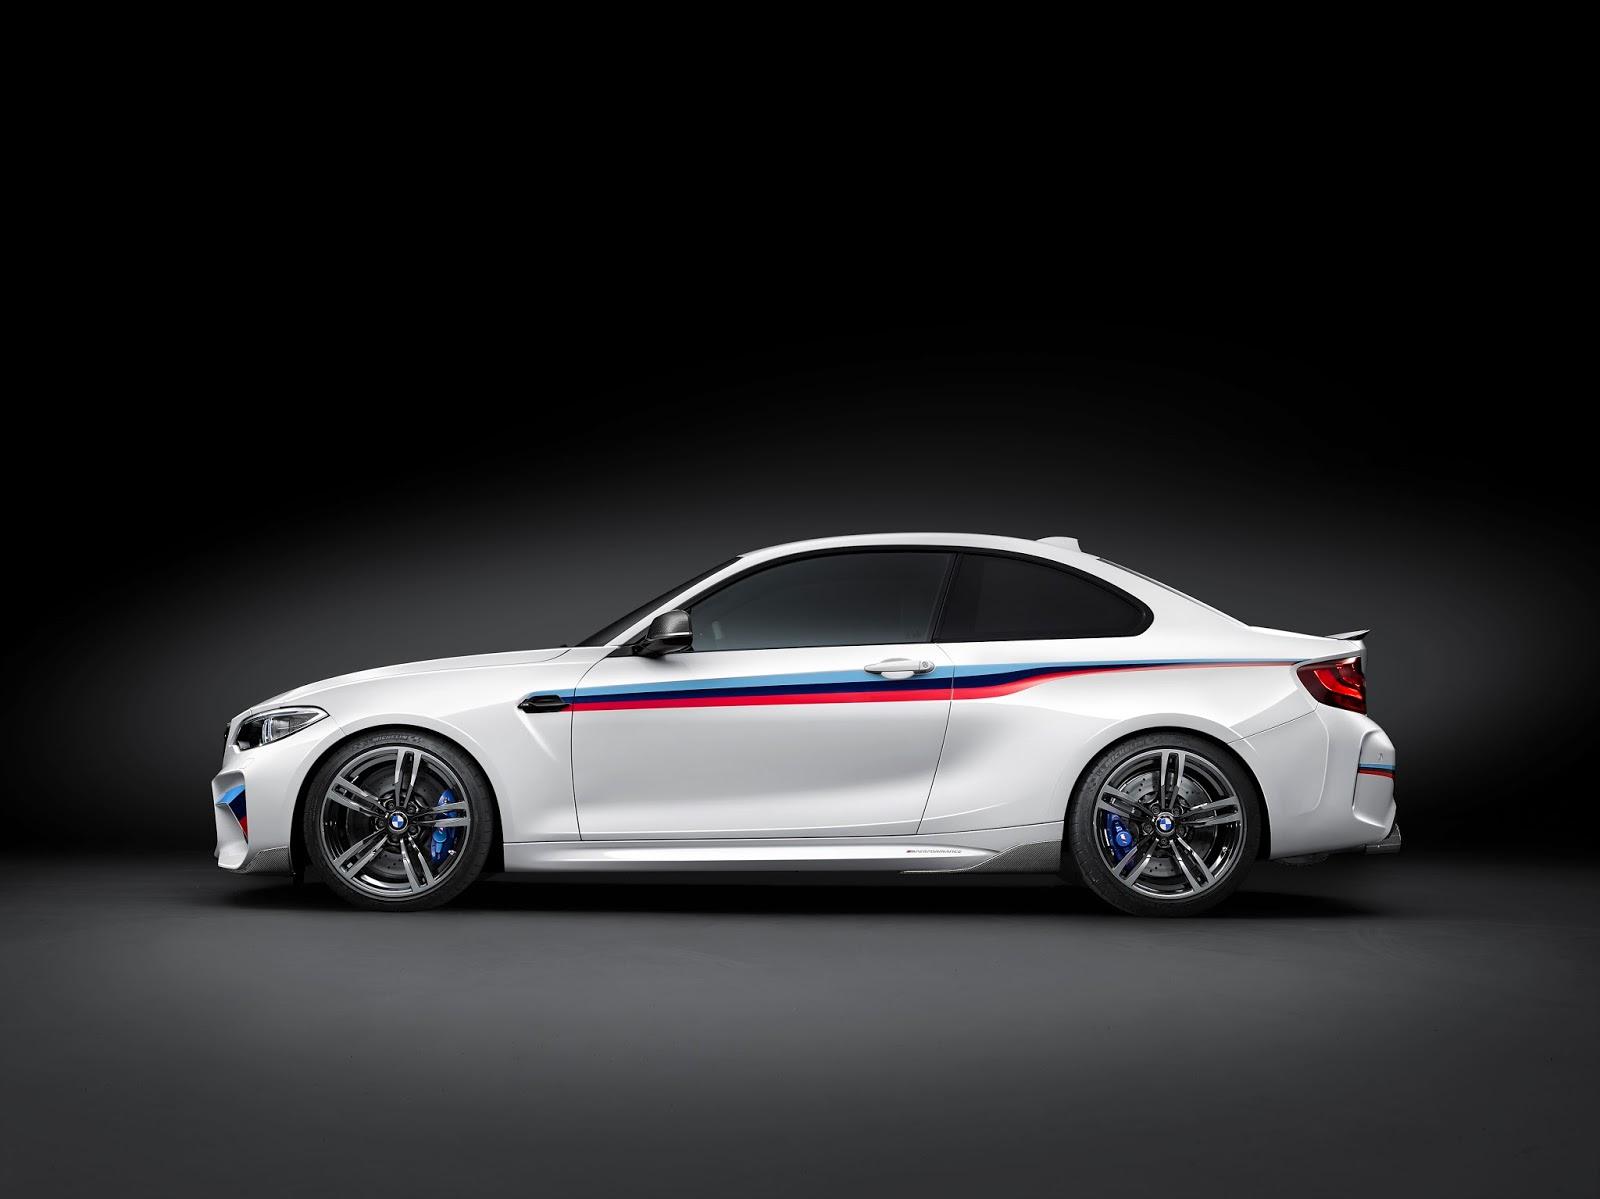 P90207897 highRes the new bmw m2 coupe Νέα Αξεσουάρ M Performance για τη νέα BMW M2 Coupé. BMW, BMW M2, BMW M2 Coupé, Αξεσουάρ